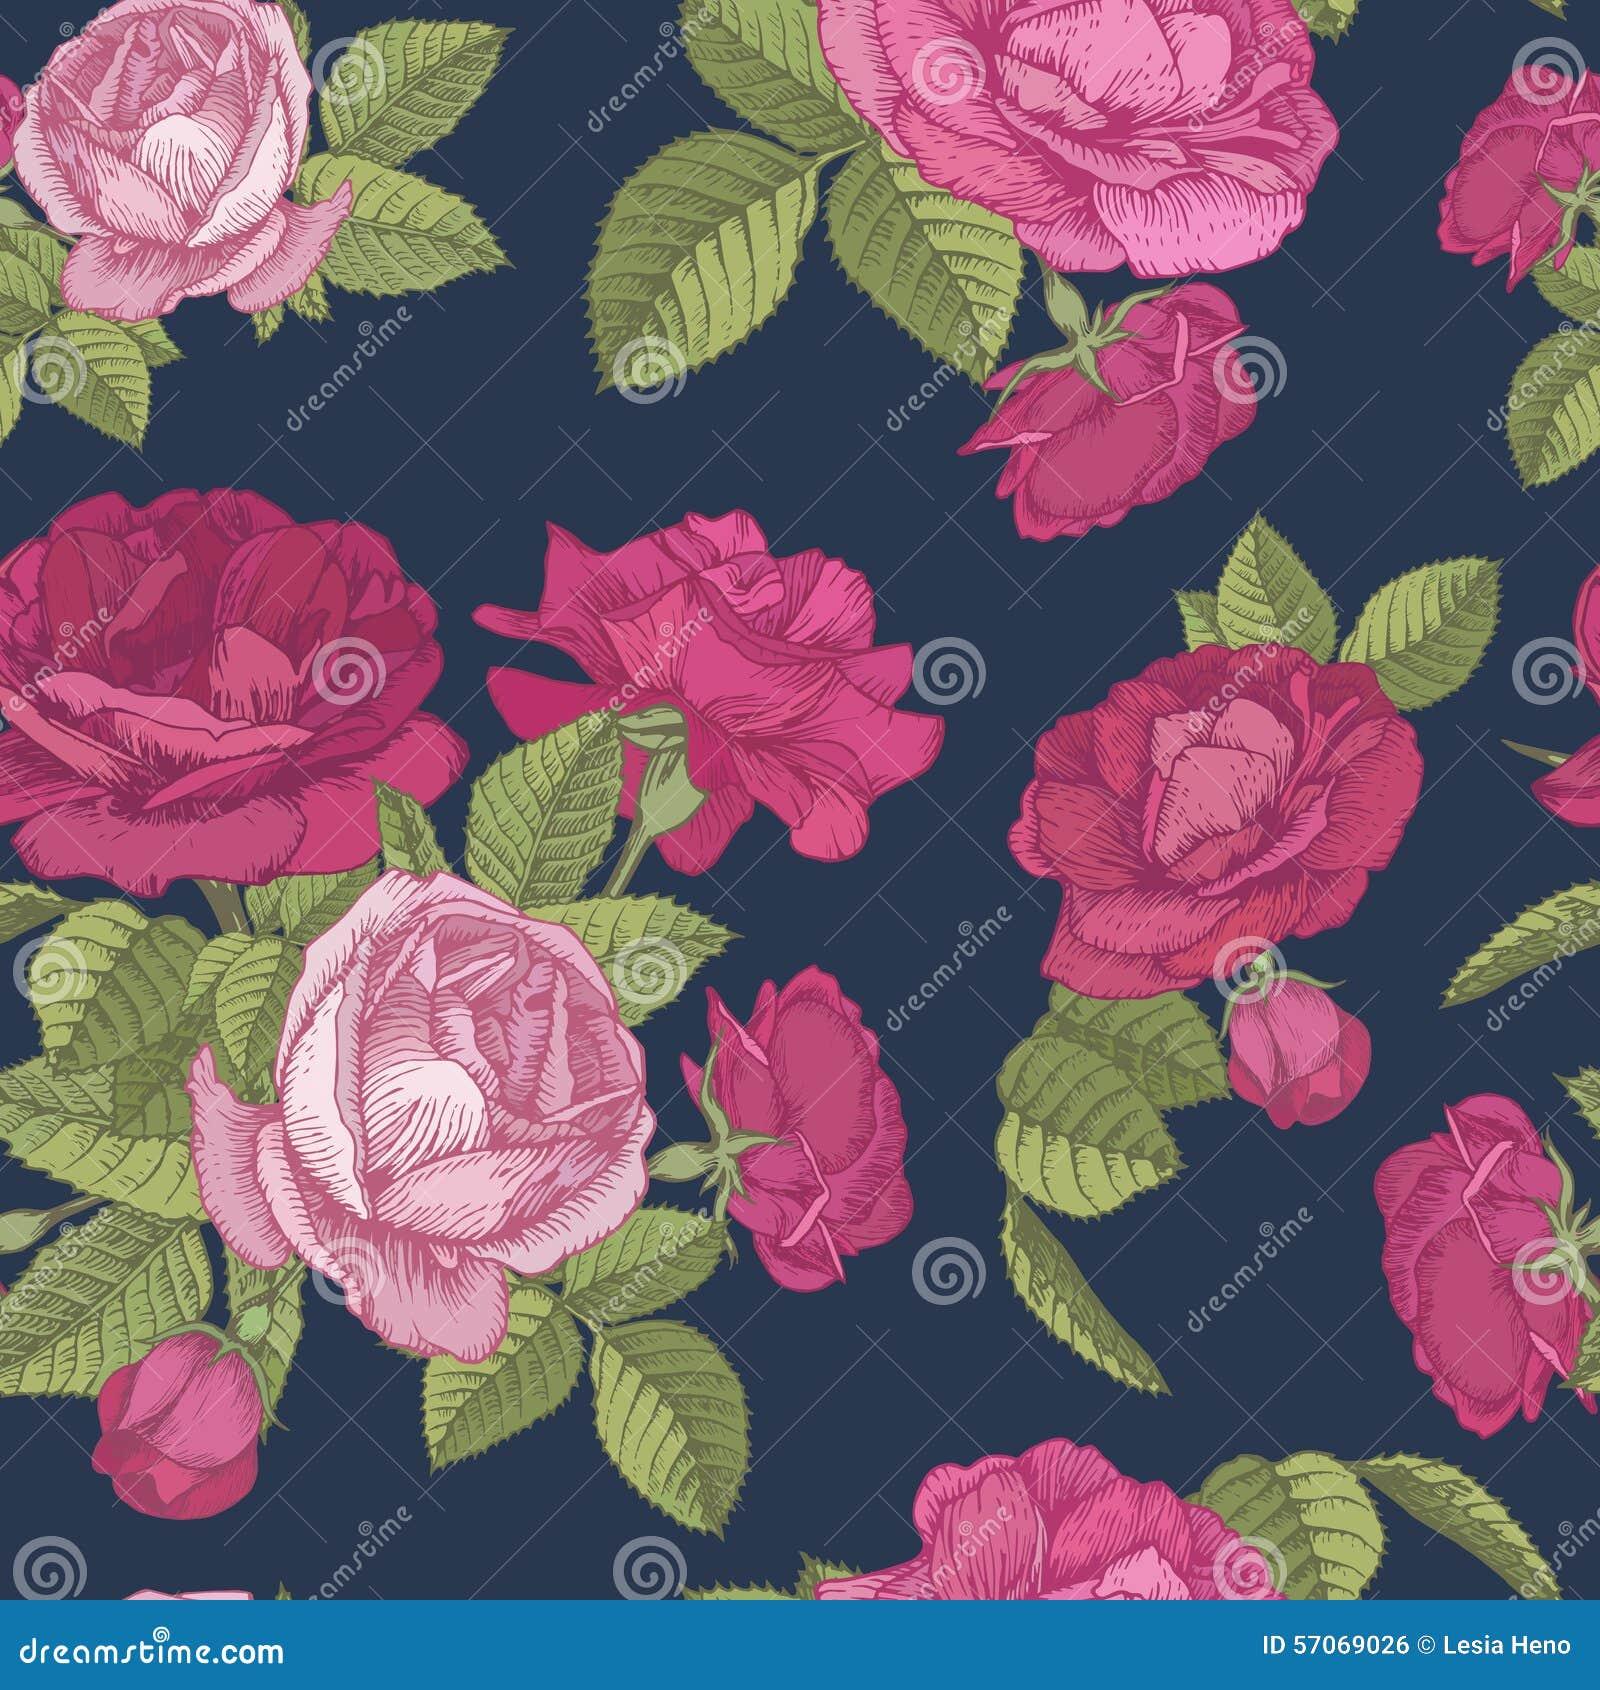 blue vintage roses wallpaper wwwimgkidcom the image